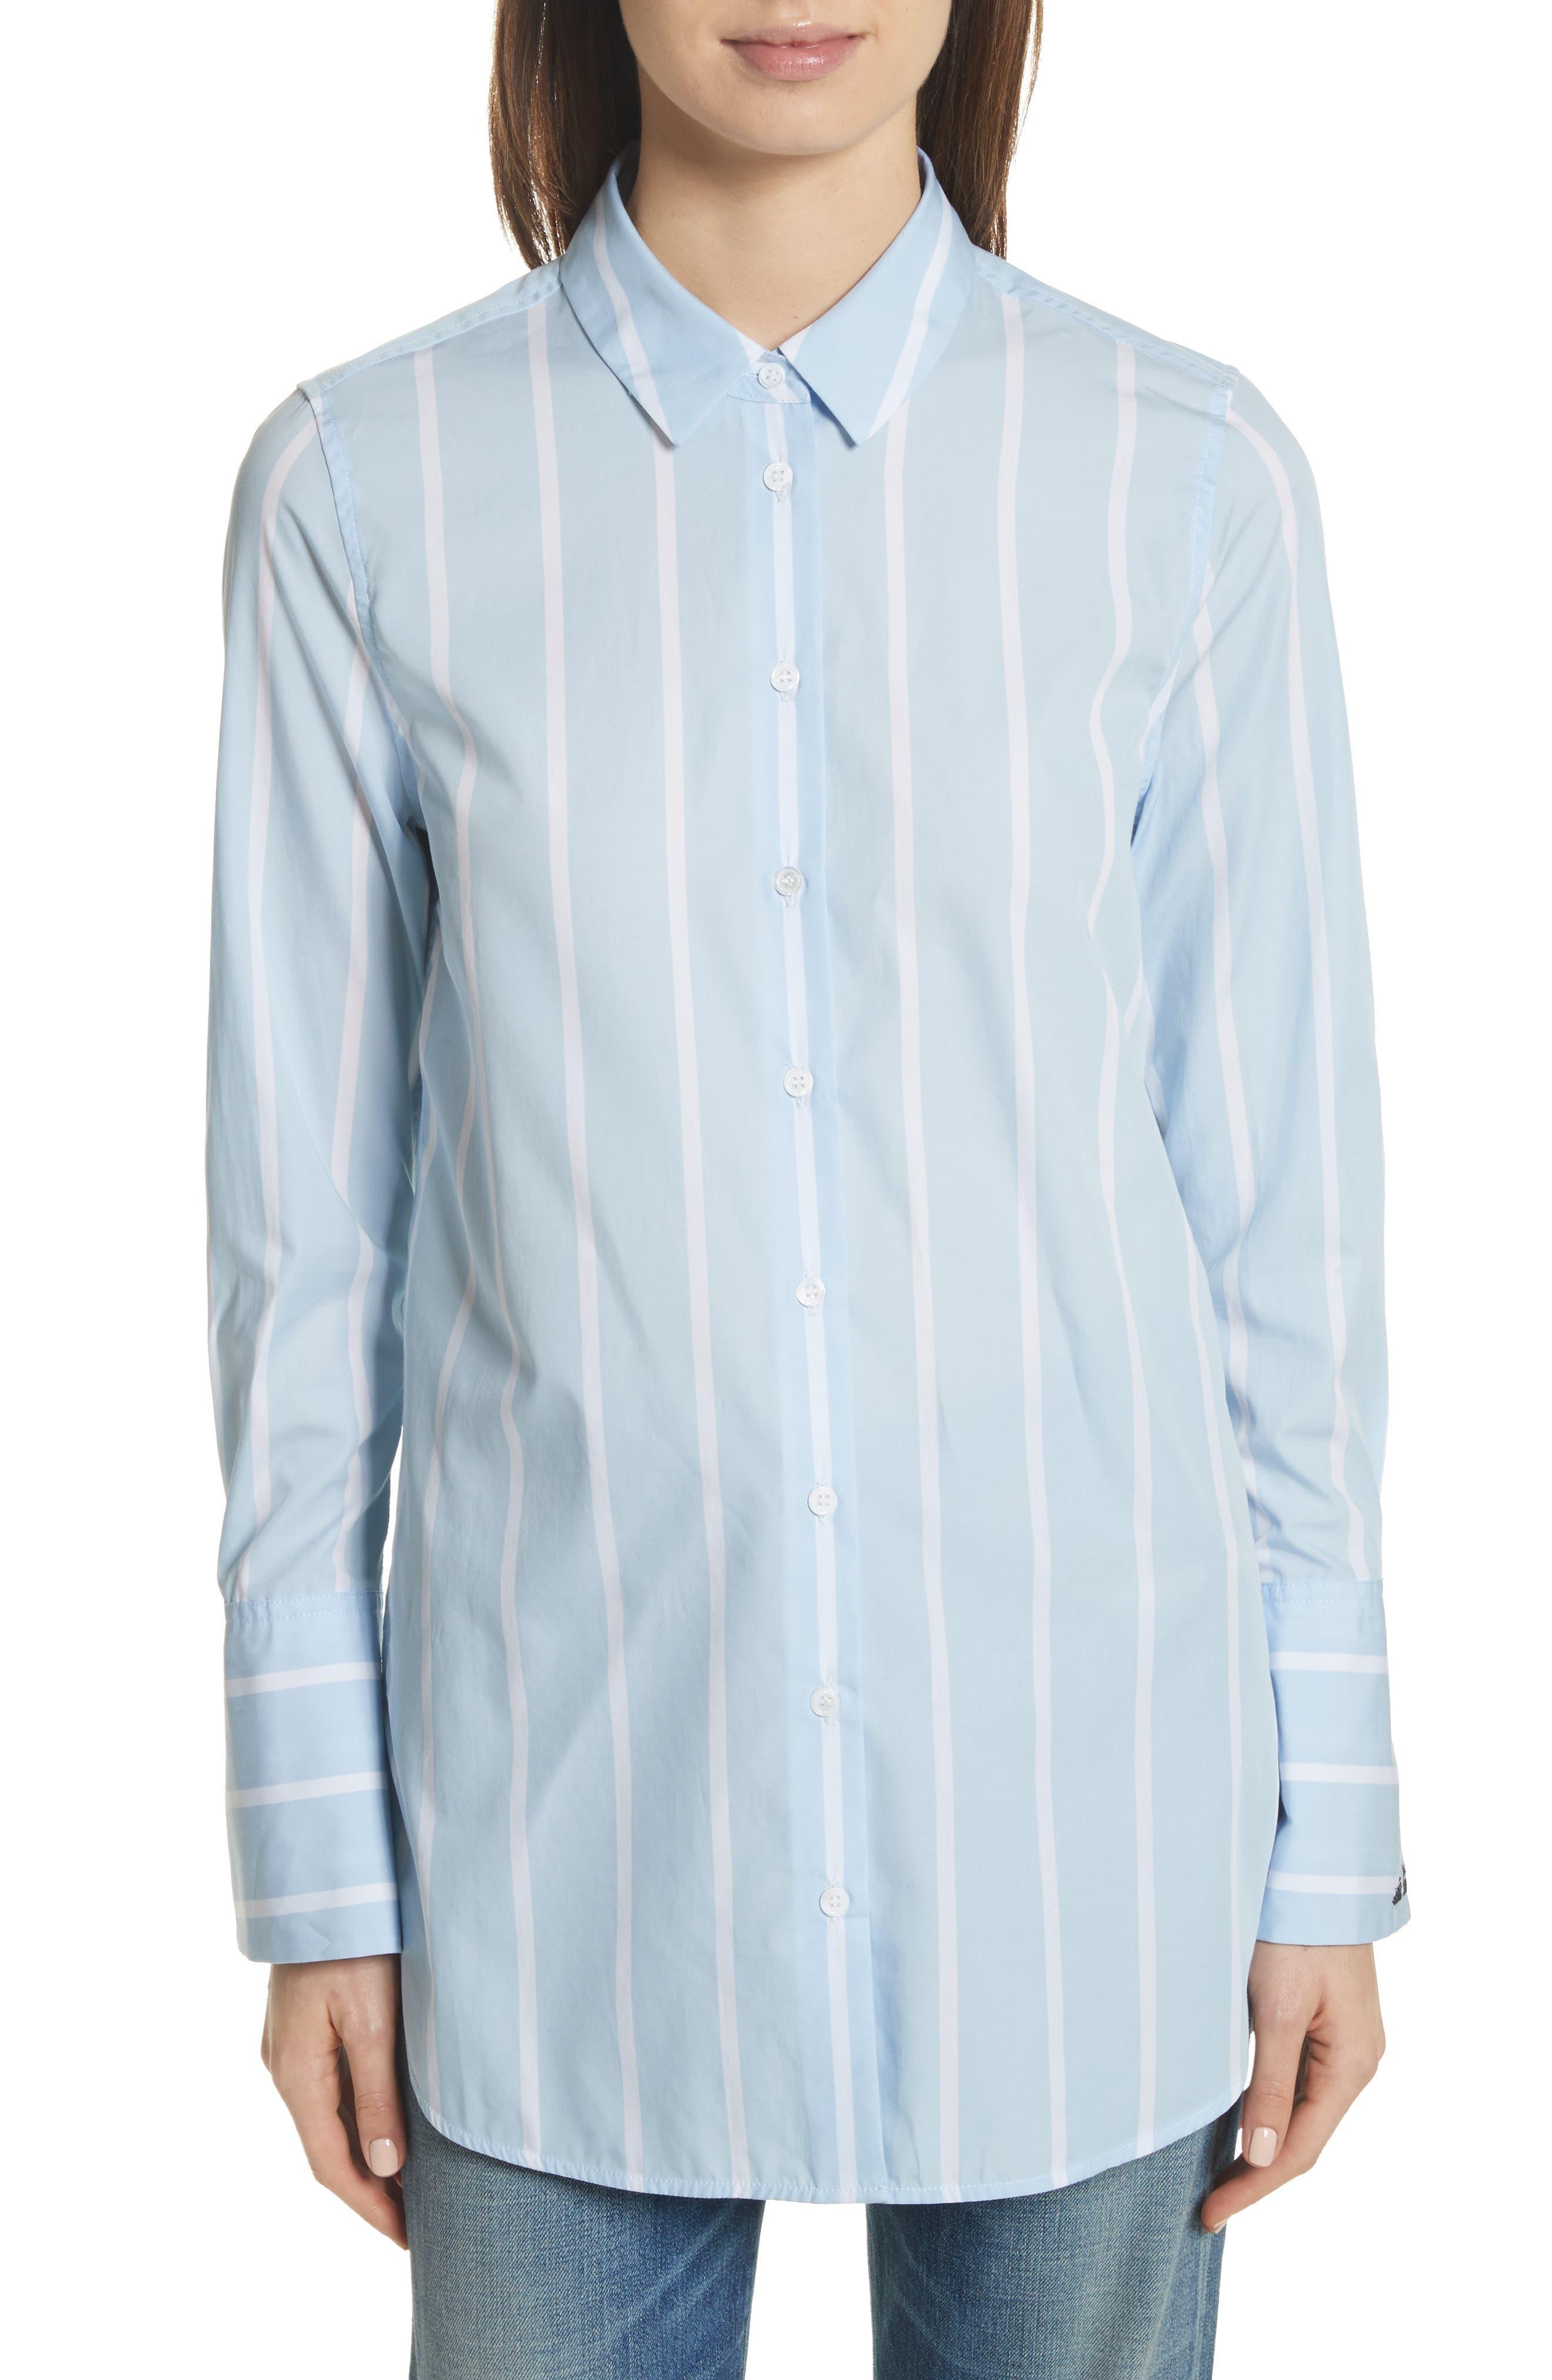 Arlette Stripe Cotton Shirt,                         Main,                         color, Skylight / Bright White